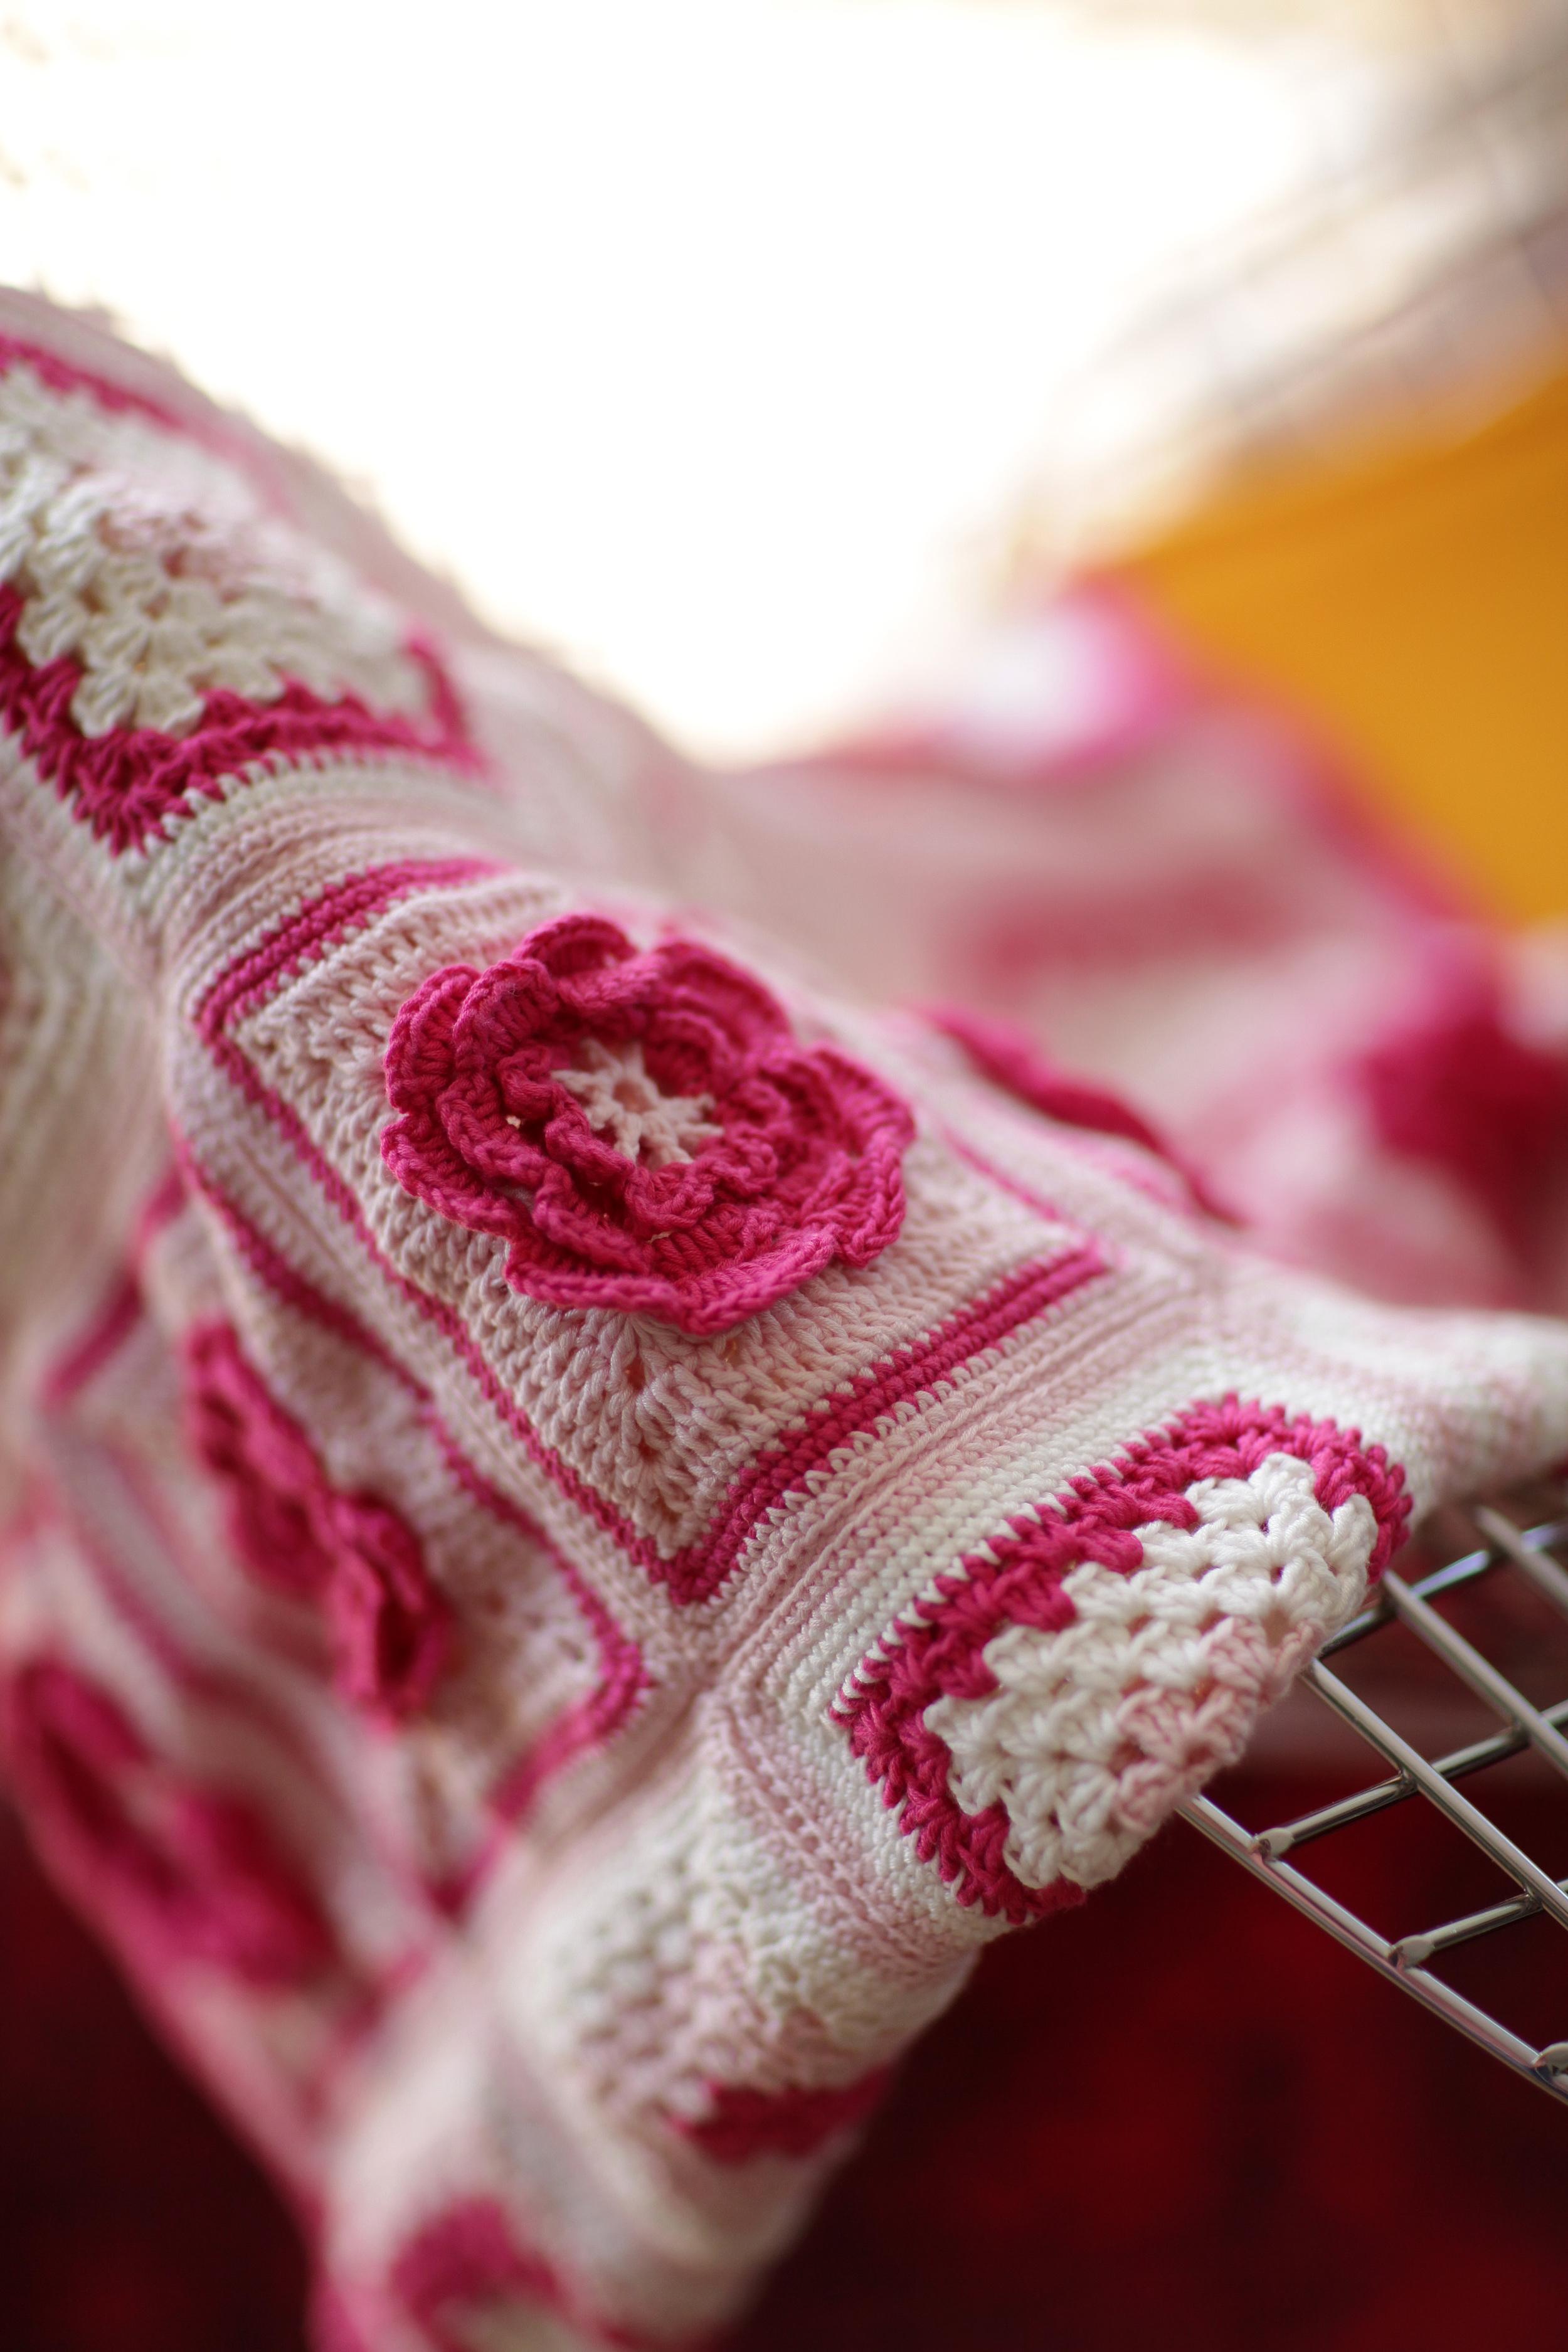 Anotherblog_Blanket2.JPG